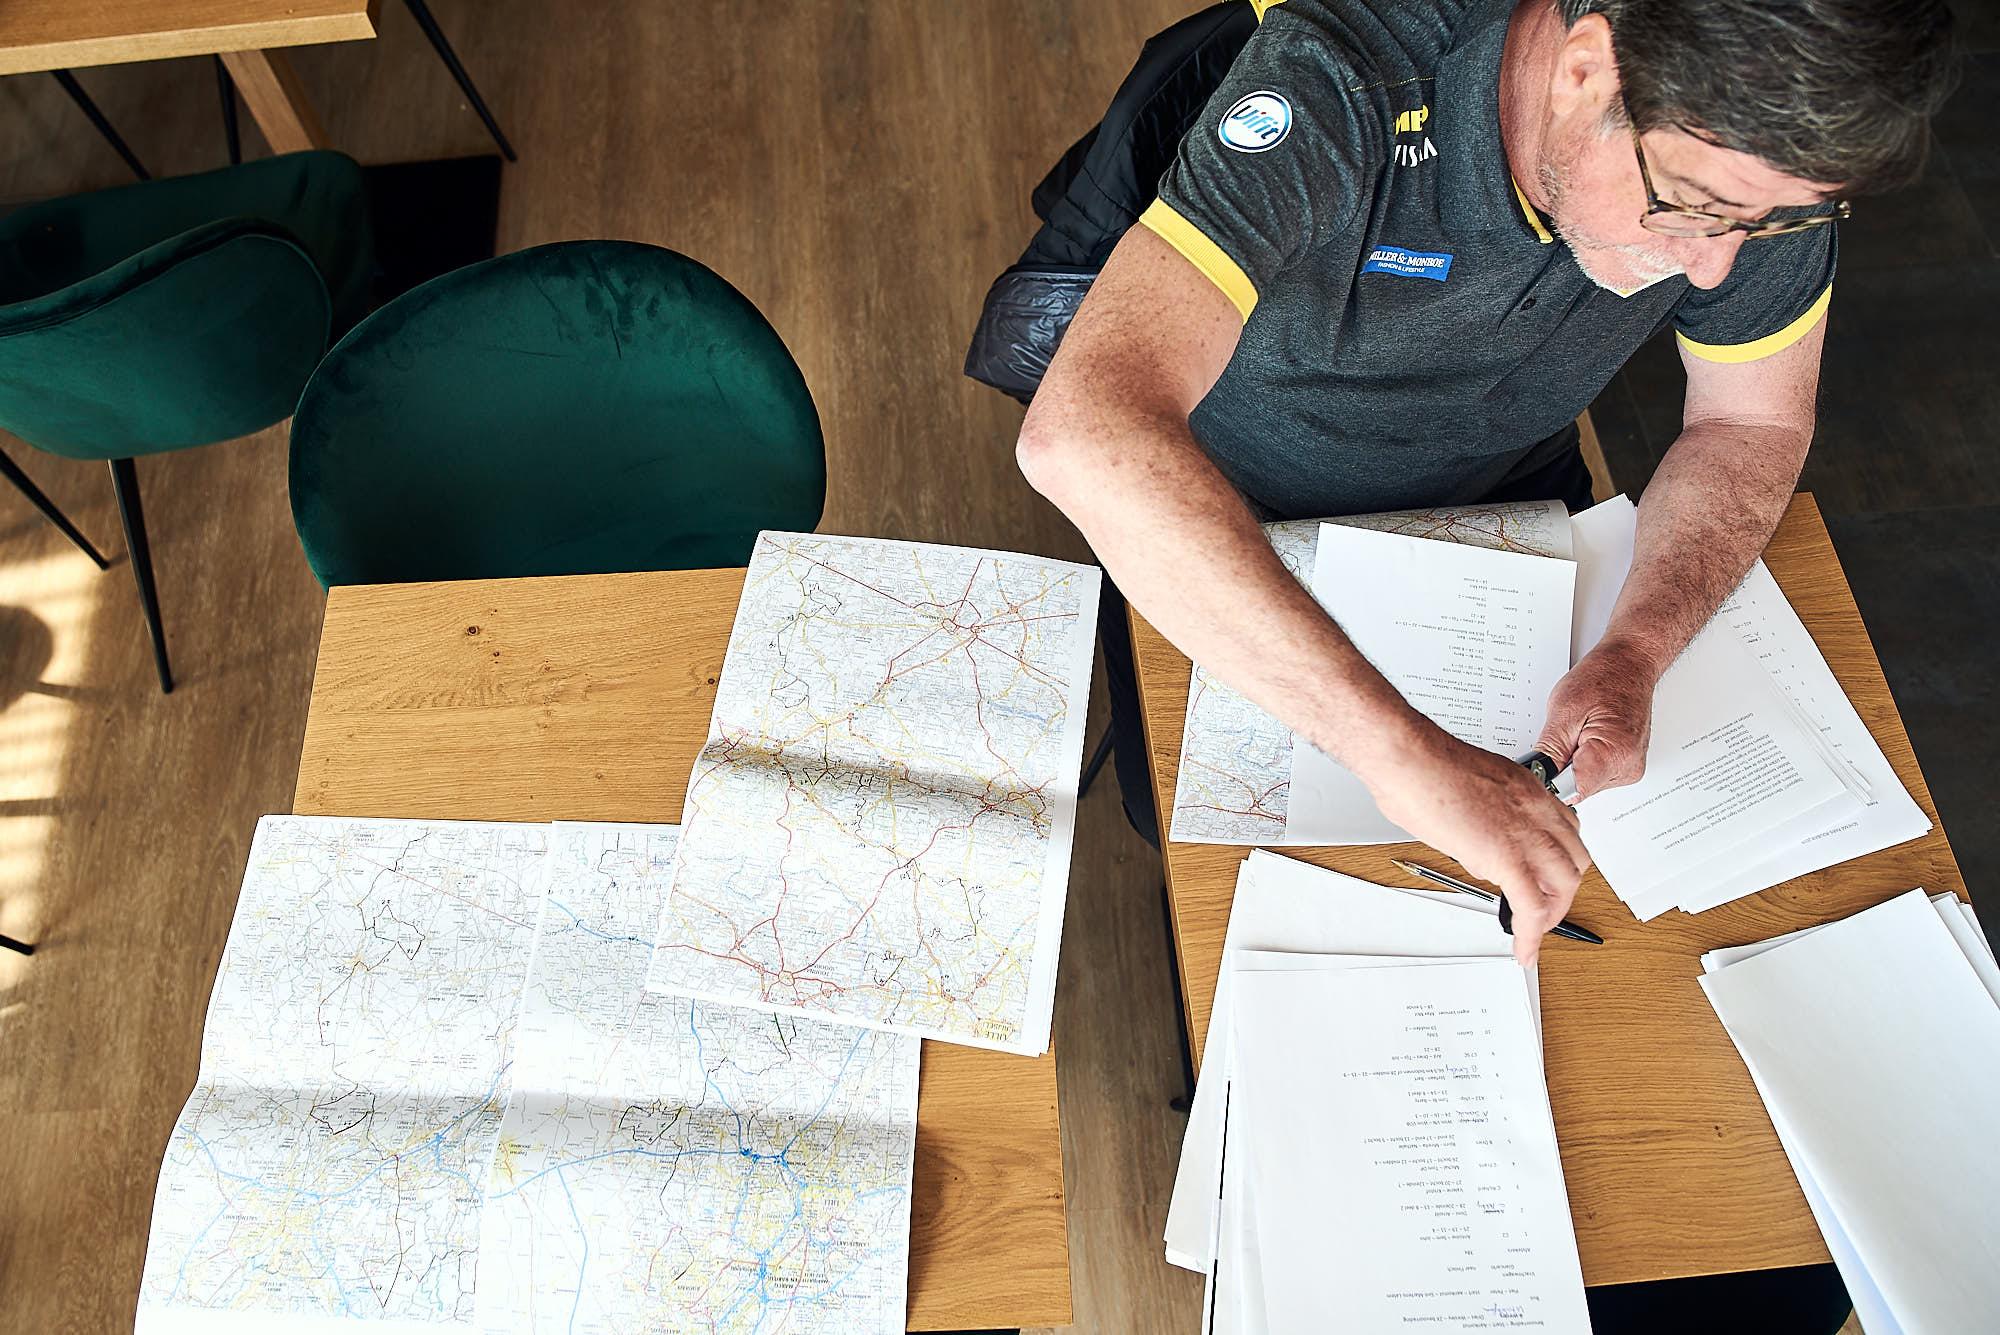 Team Jumbo-Visma member of staff planning logistics for Paris-Roubaix